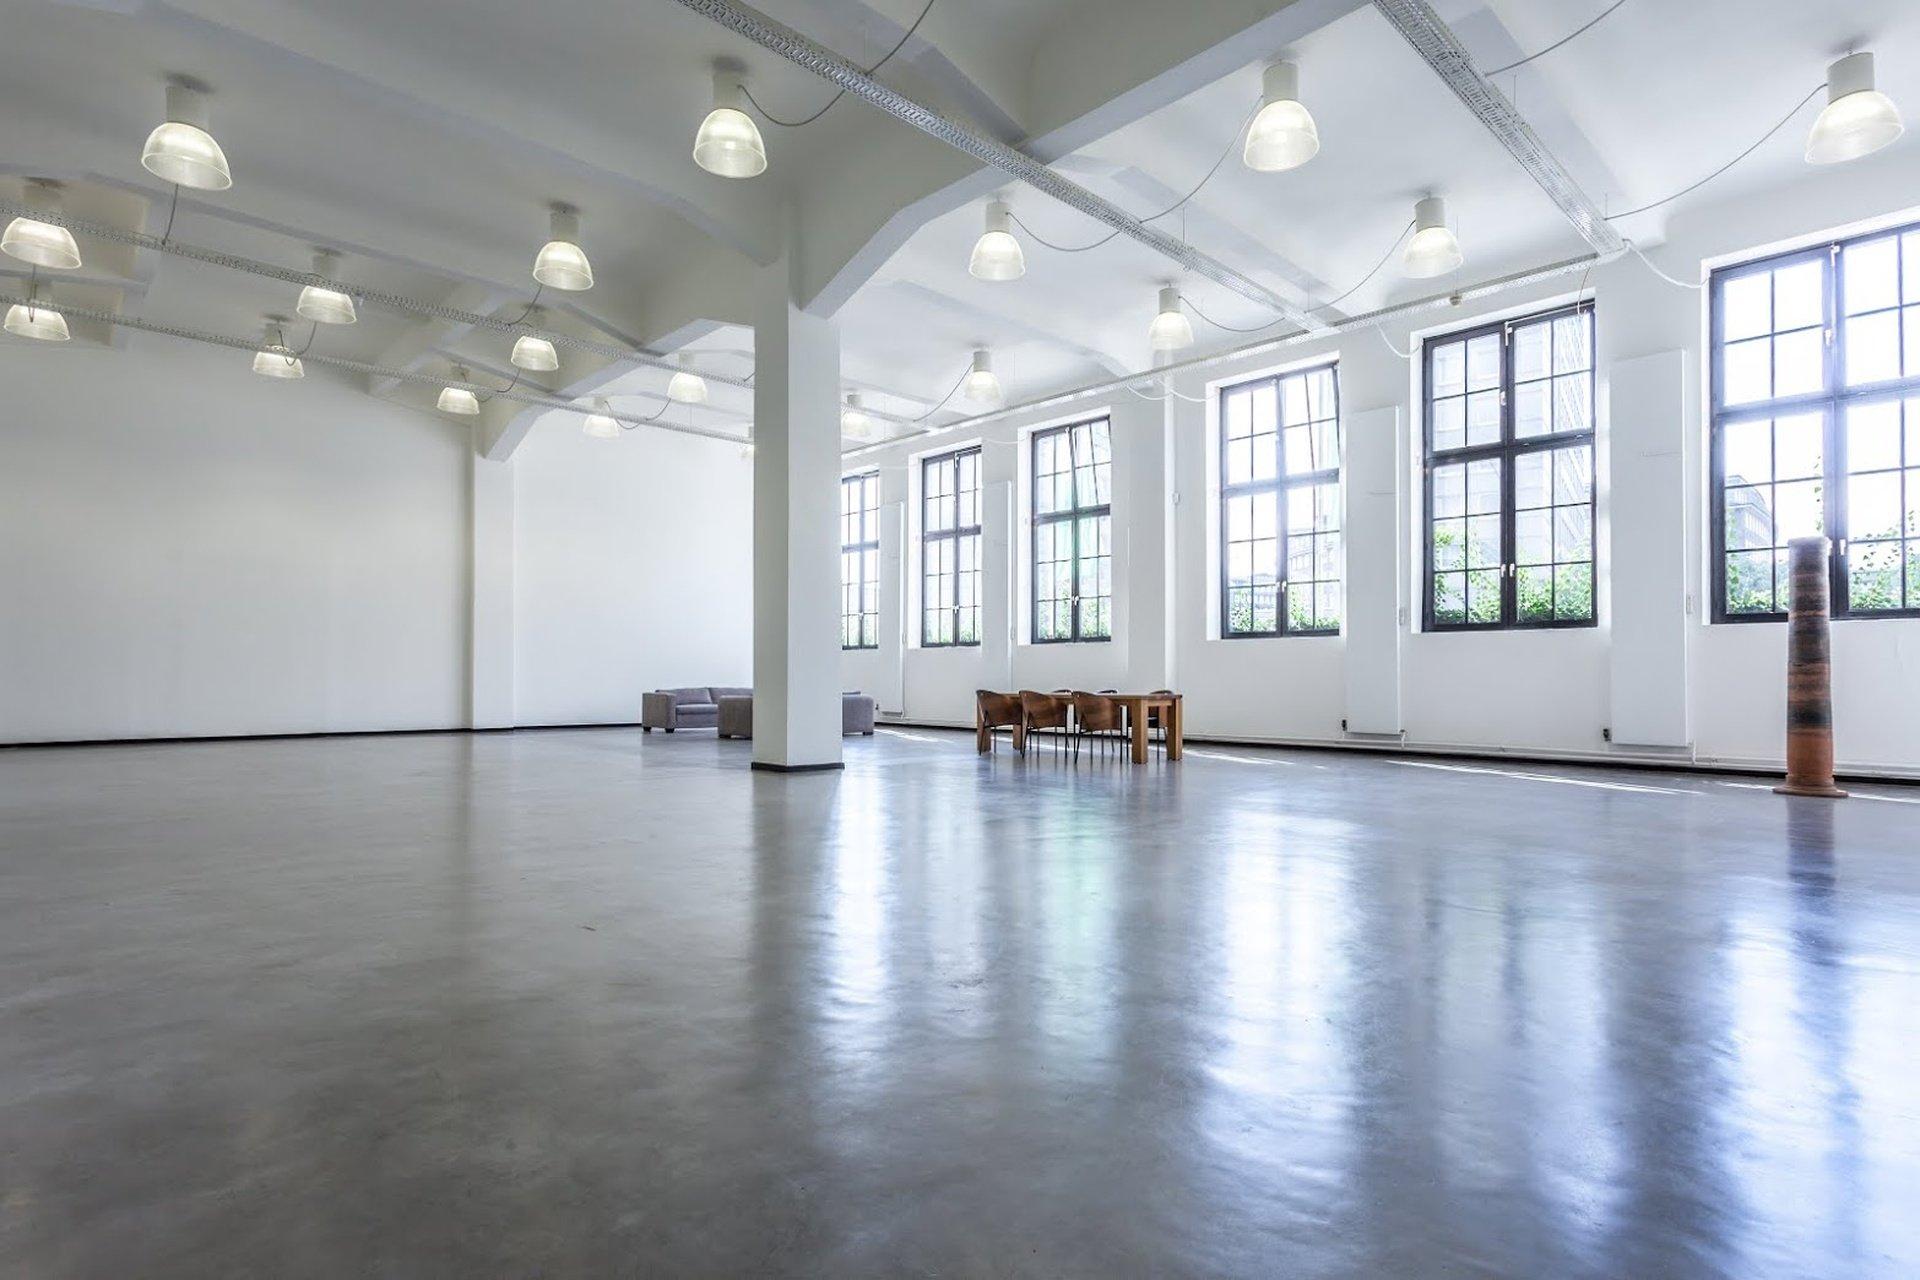 Hamburg corporate event venues Gallery Barlach Halle K  image 0